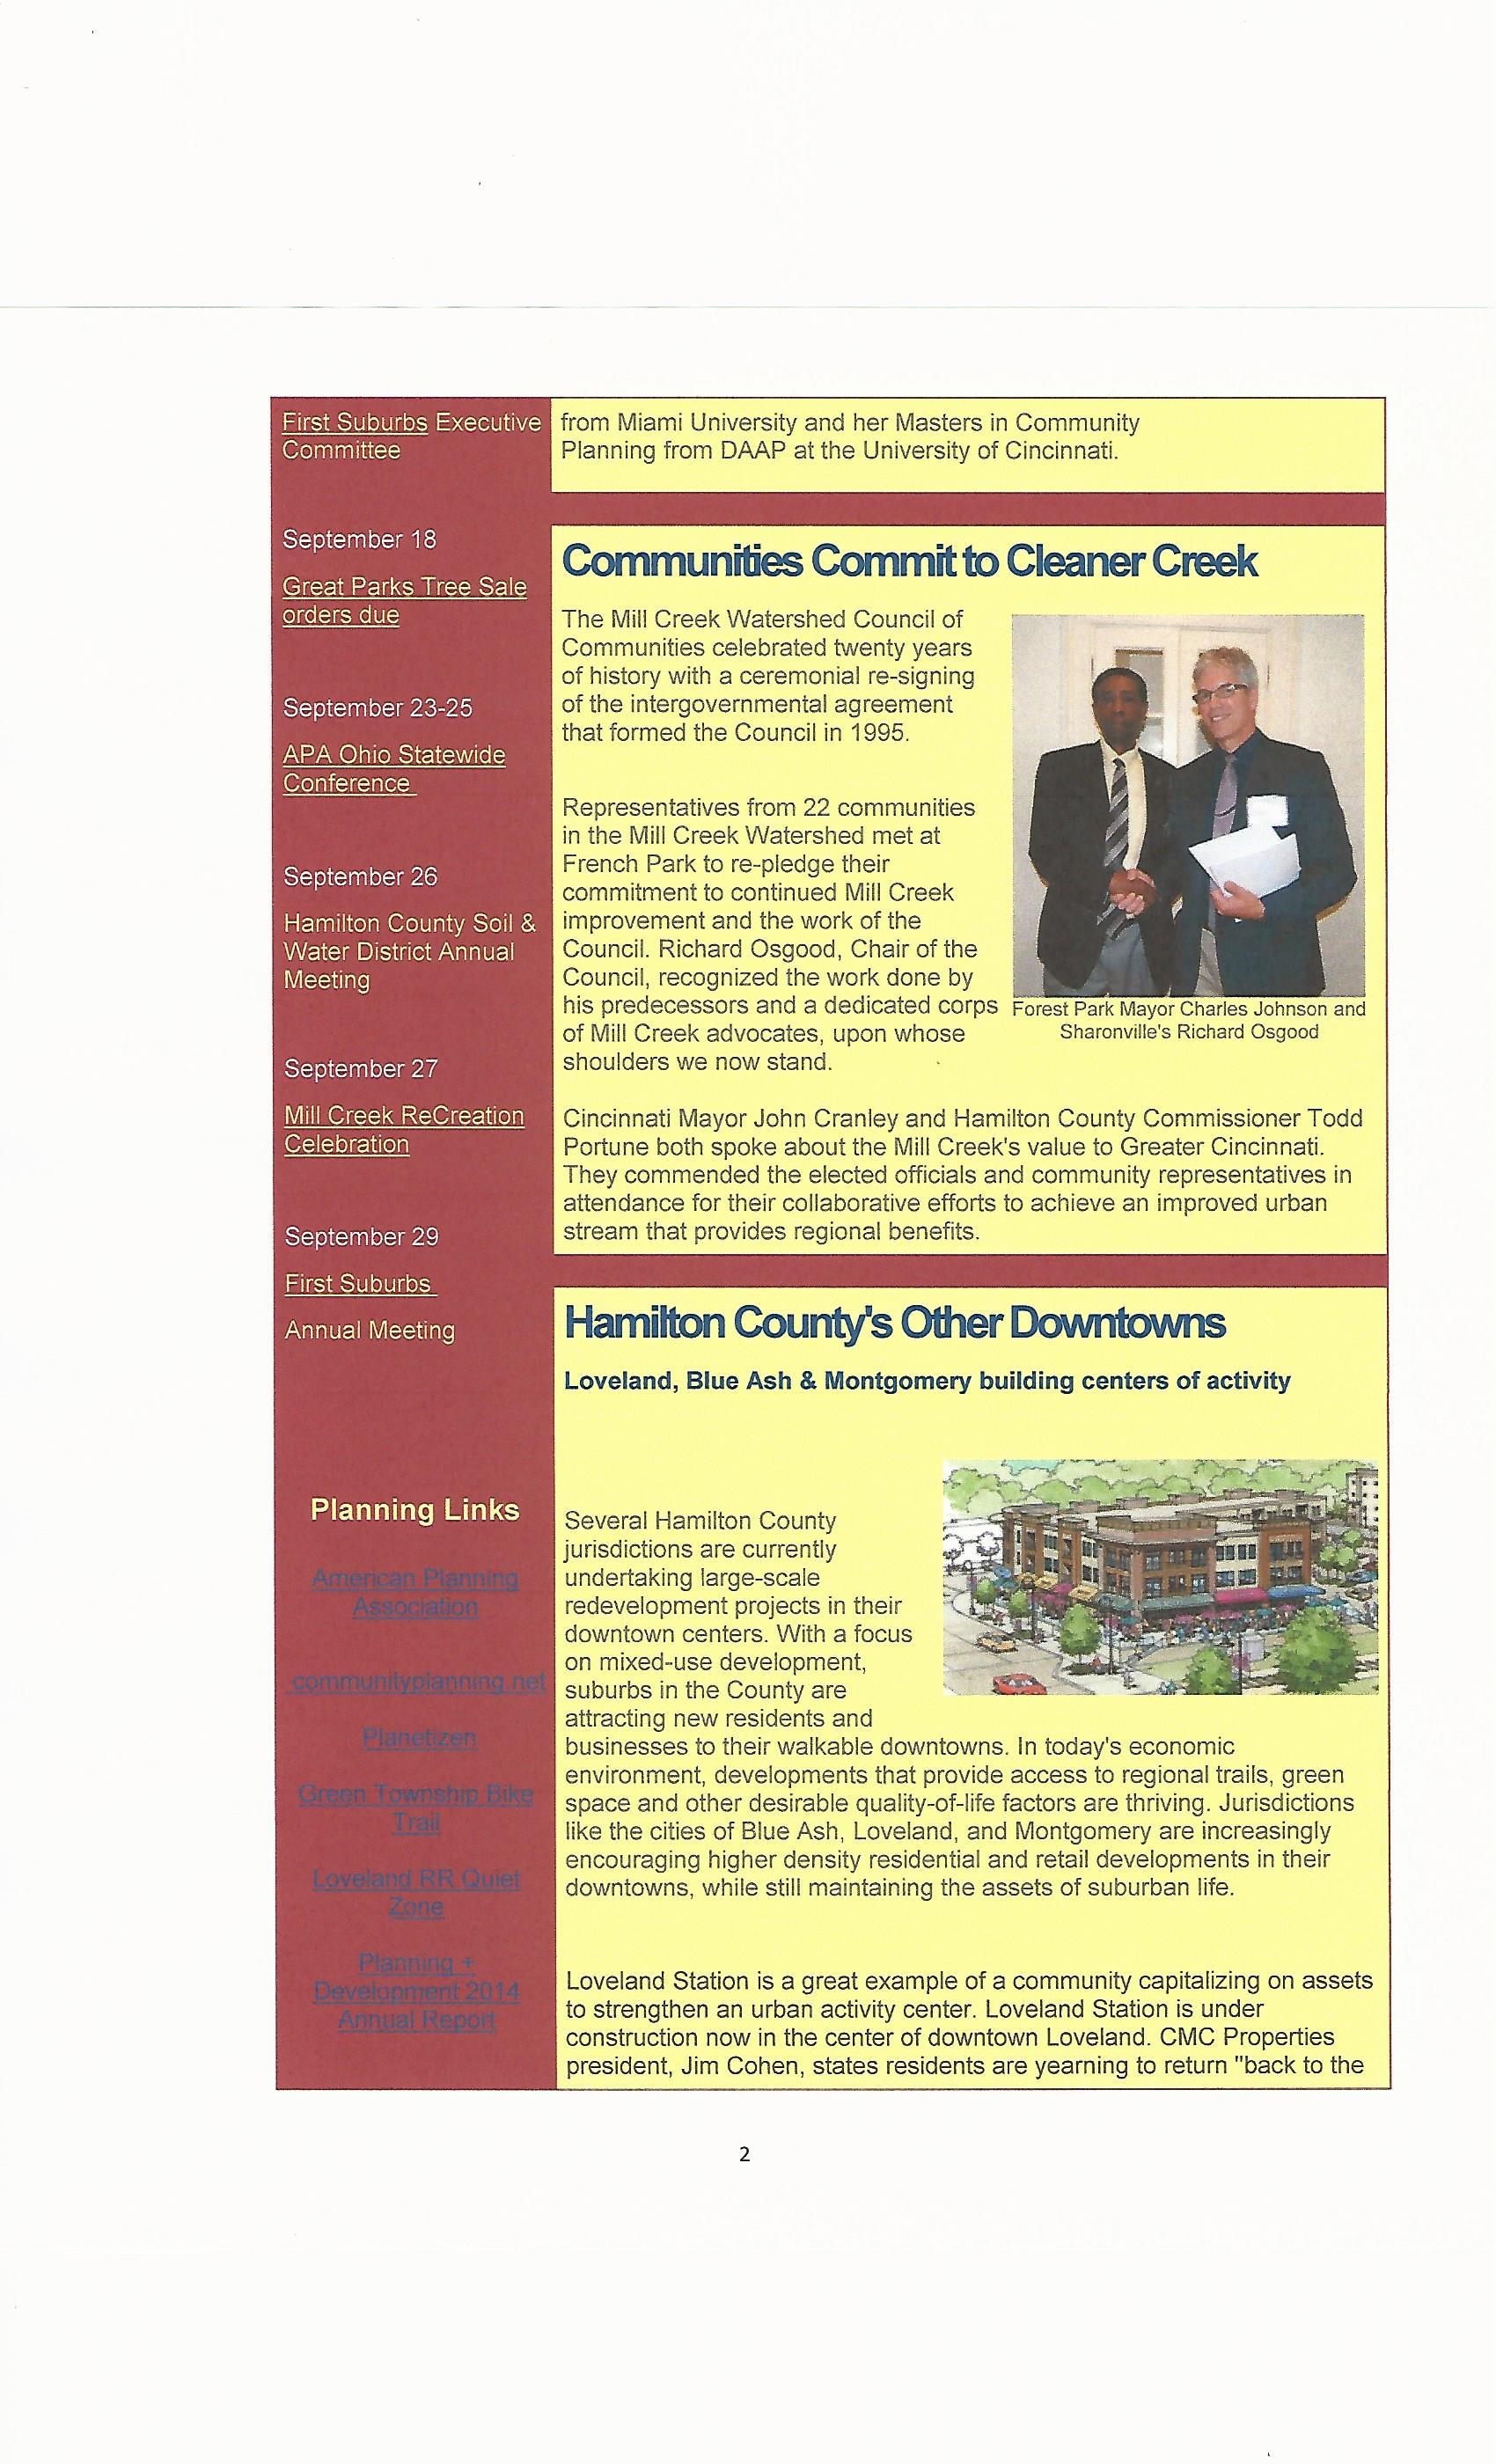 Hamilton Planning Press_Council 20th_Aug 2015.jpg